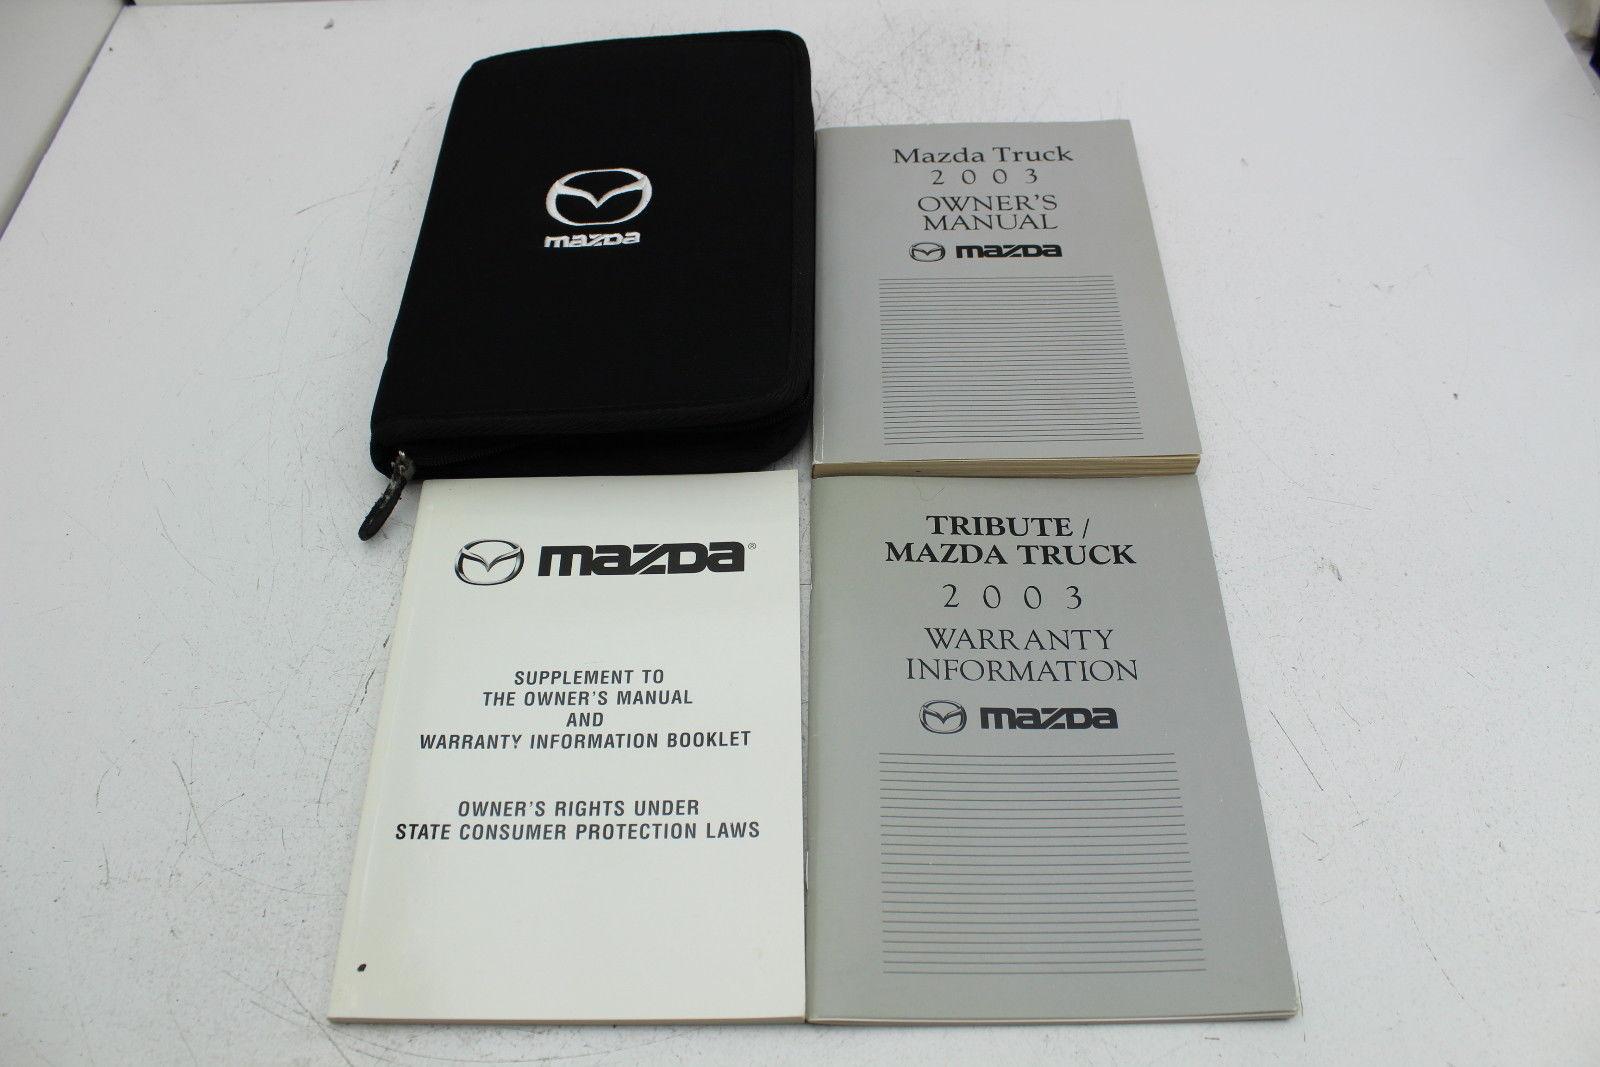 03 mazda tribute vehicle owners manual and 50 similar items rh bonanza com 2012 Mazda 3 Mazda CX-9